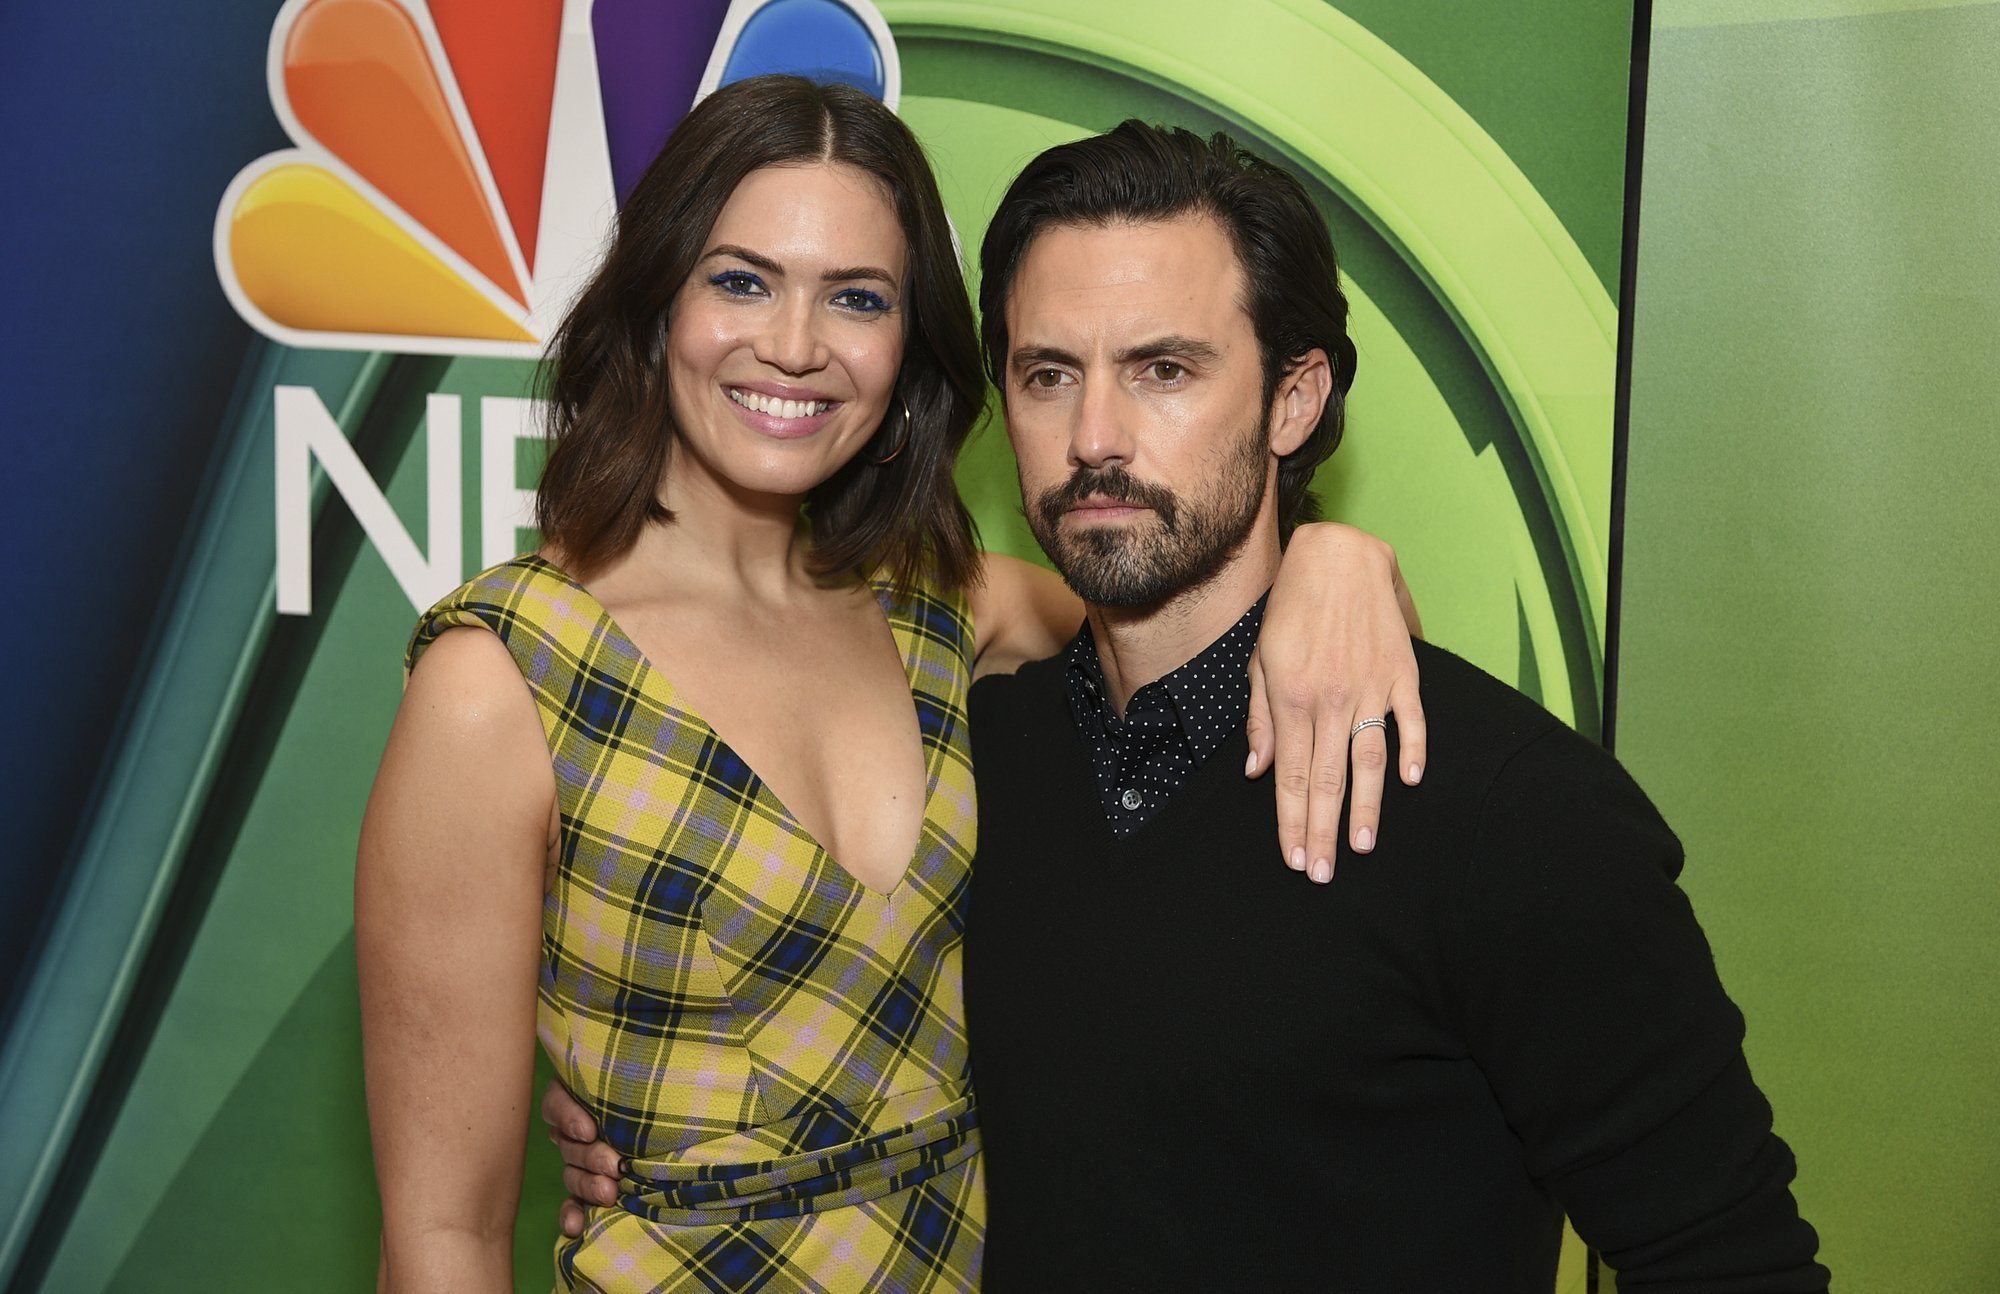 NBC shows off fall lineup with stars, athletes, Kardashians